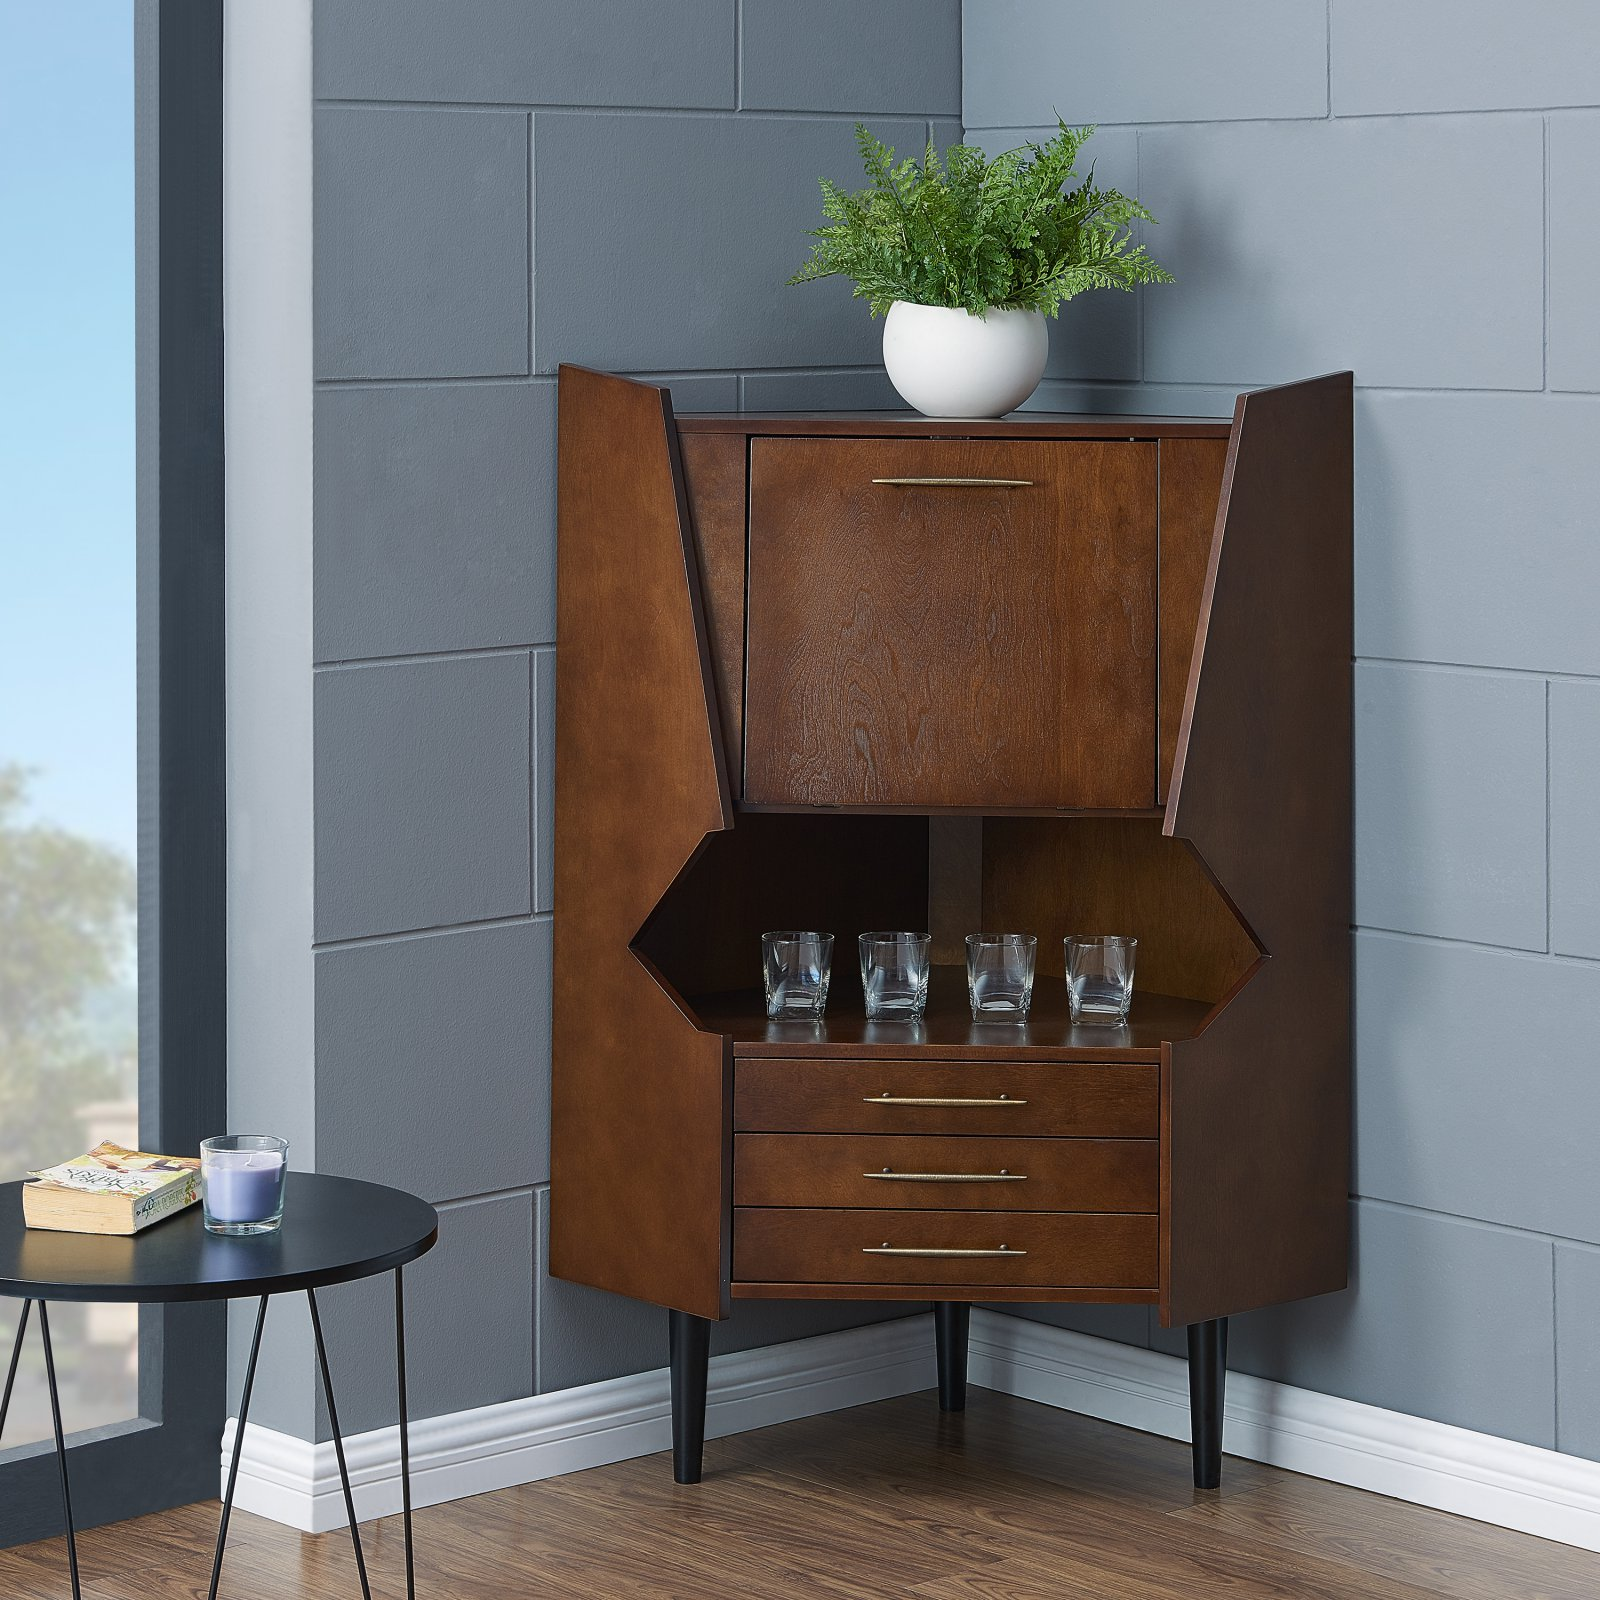 Southern Enterprises Lohell Corner Bar Cabinet